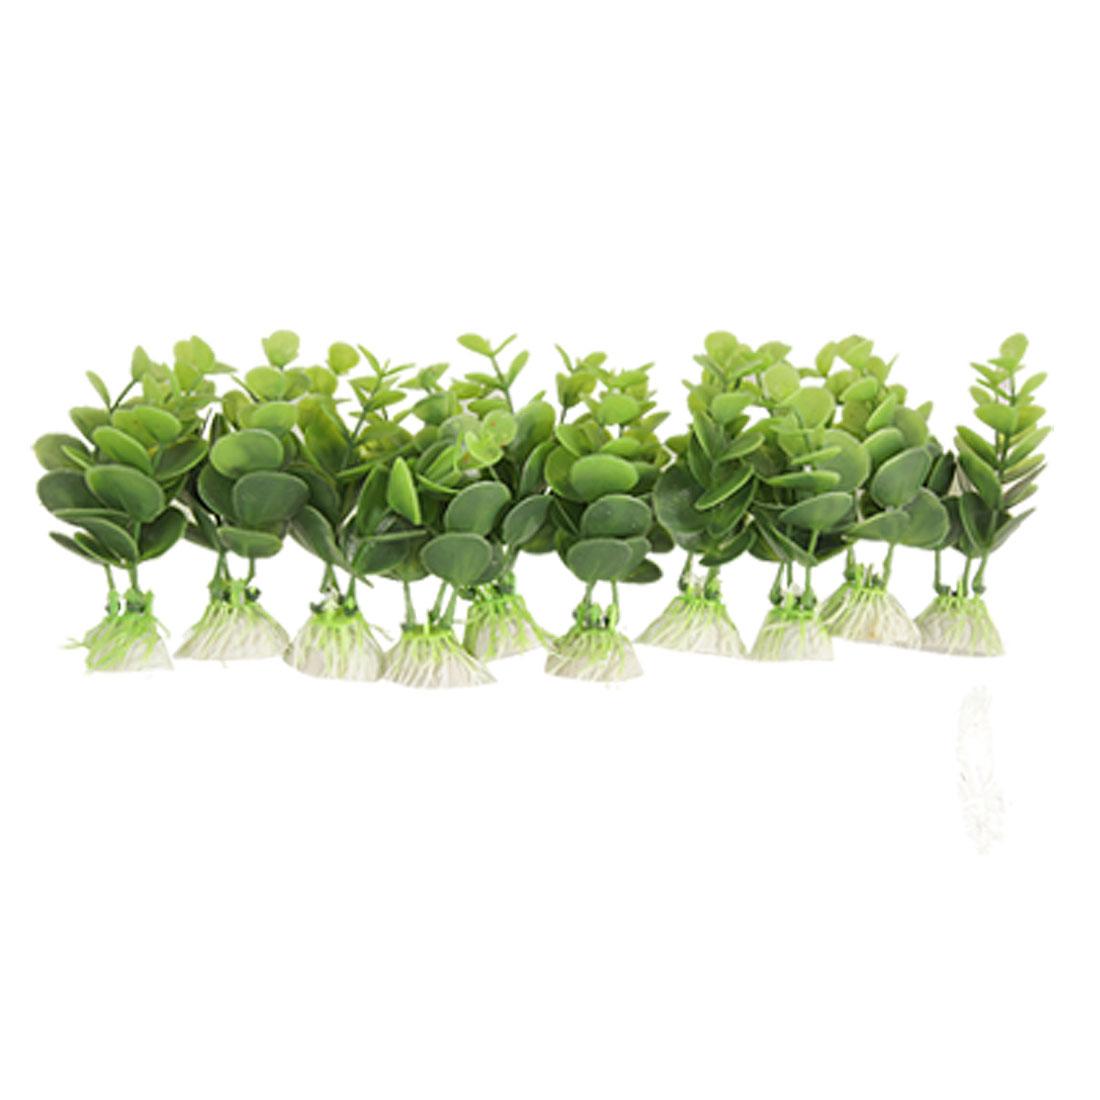 10 Pcs Green Plastic Plants Grass Decor Ornament for Fish Tank